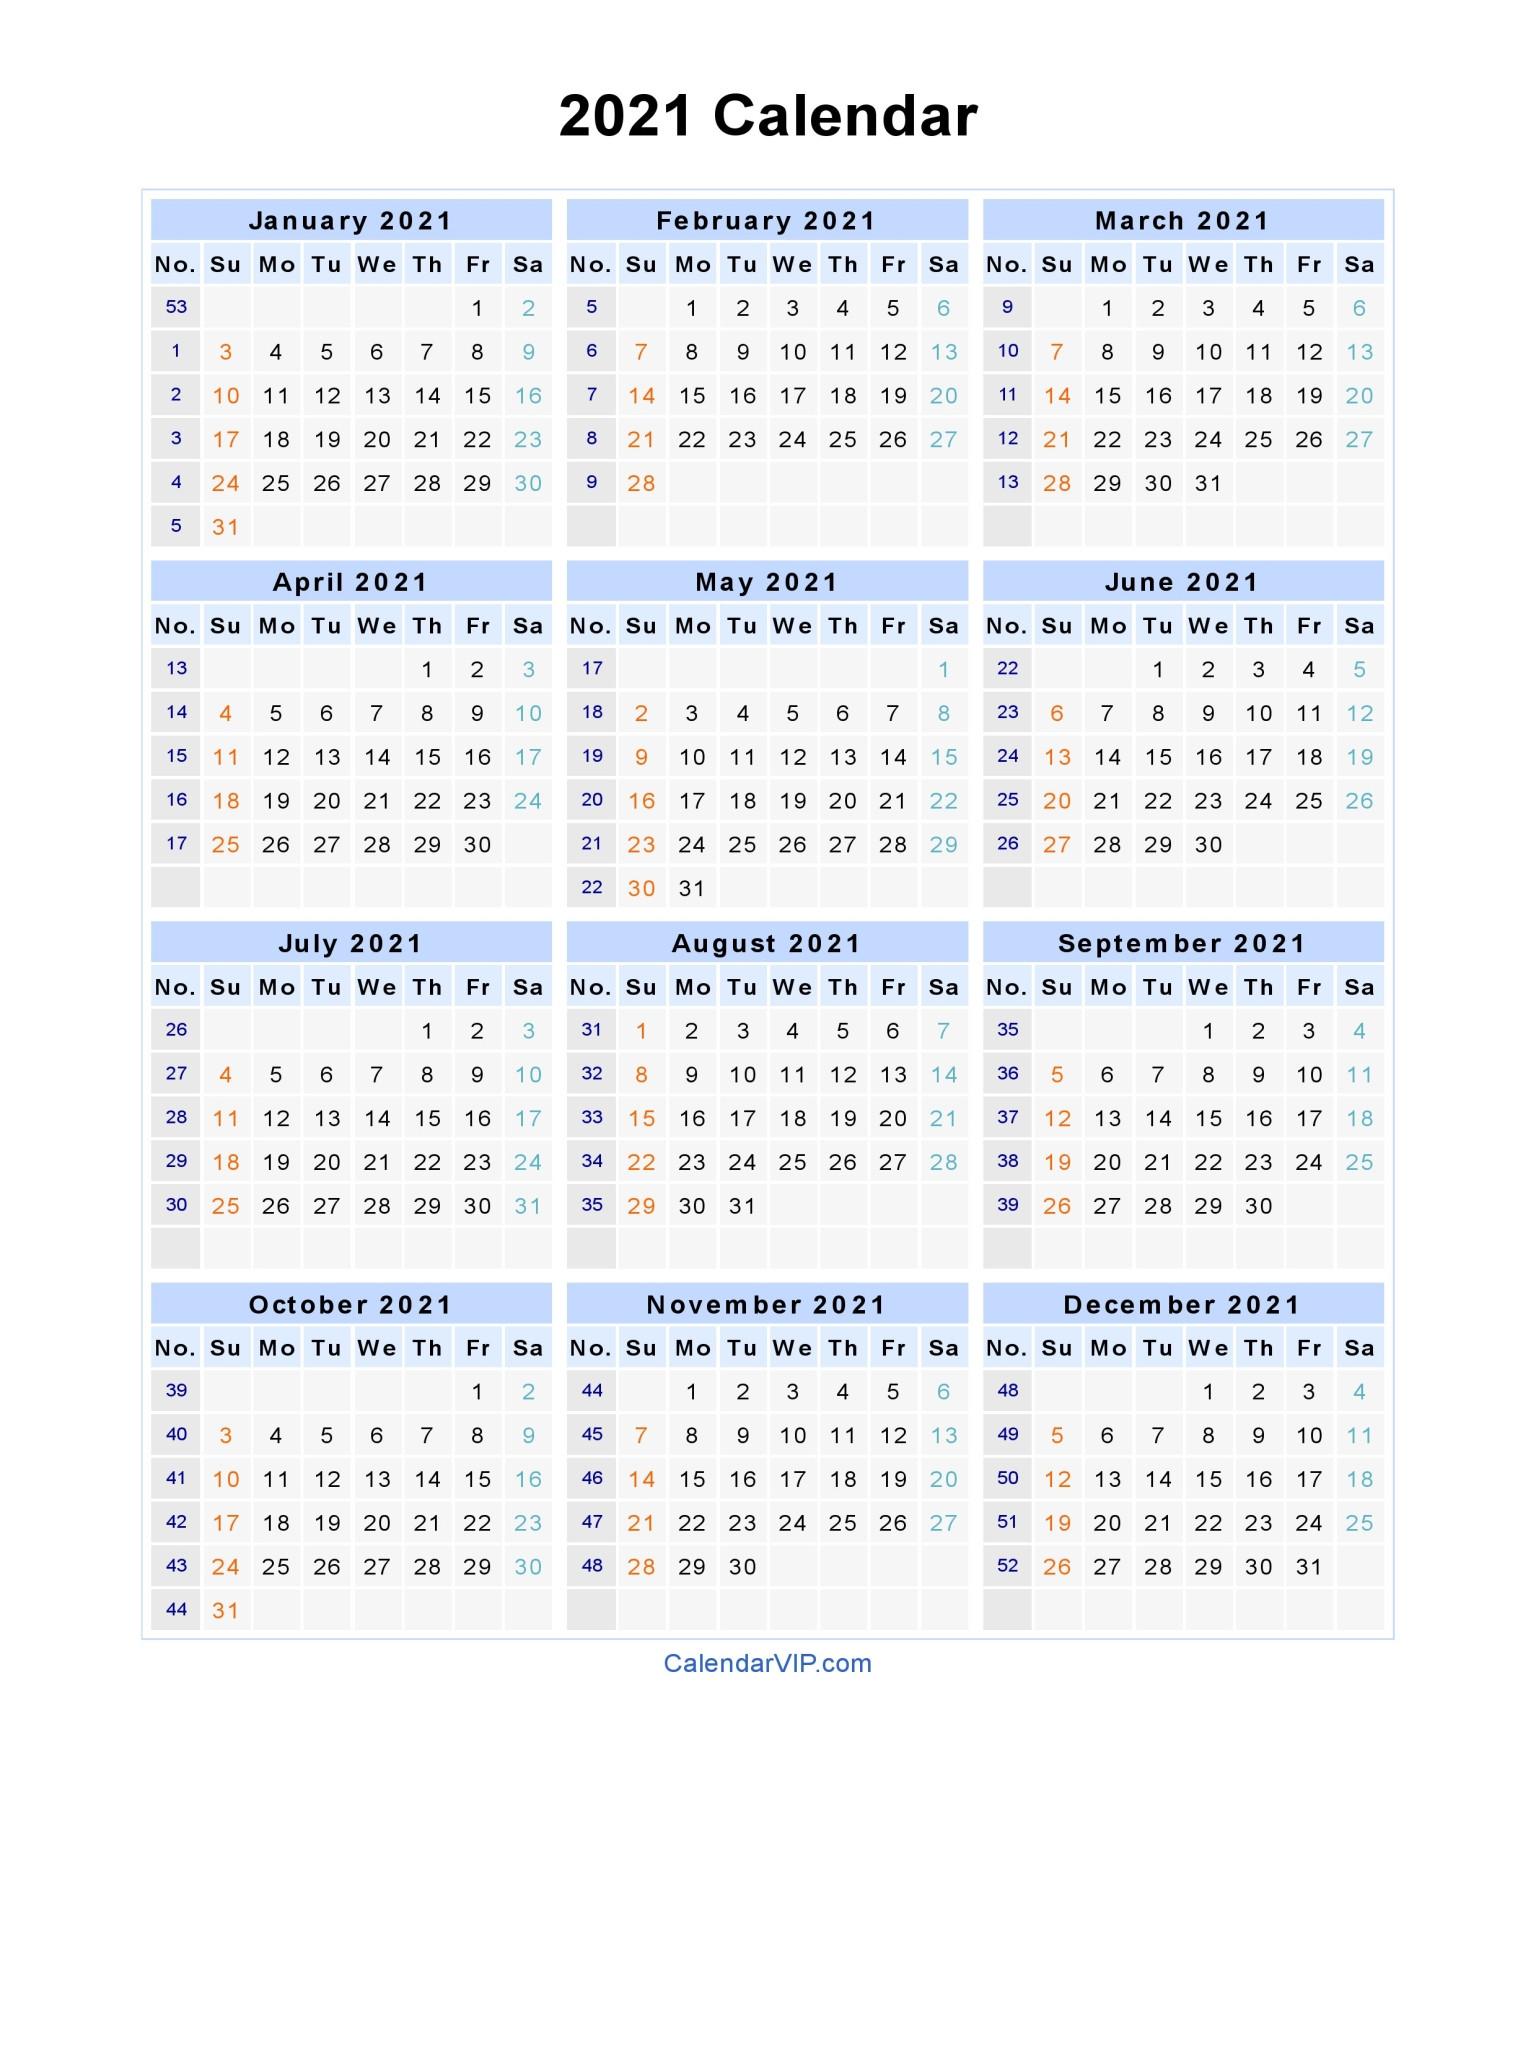 2021 Calendar Printable-Free Printable Downloadable Yearly Calendar 2021